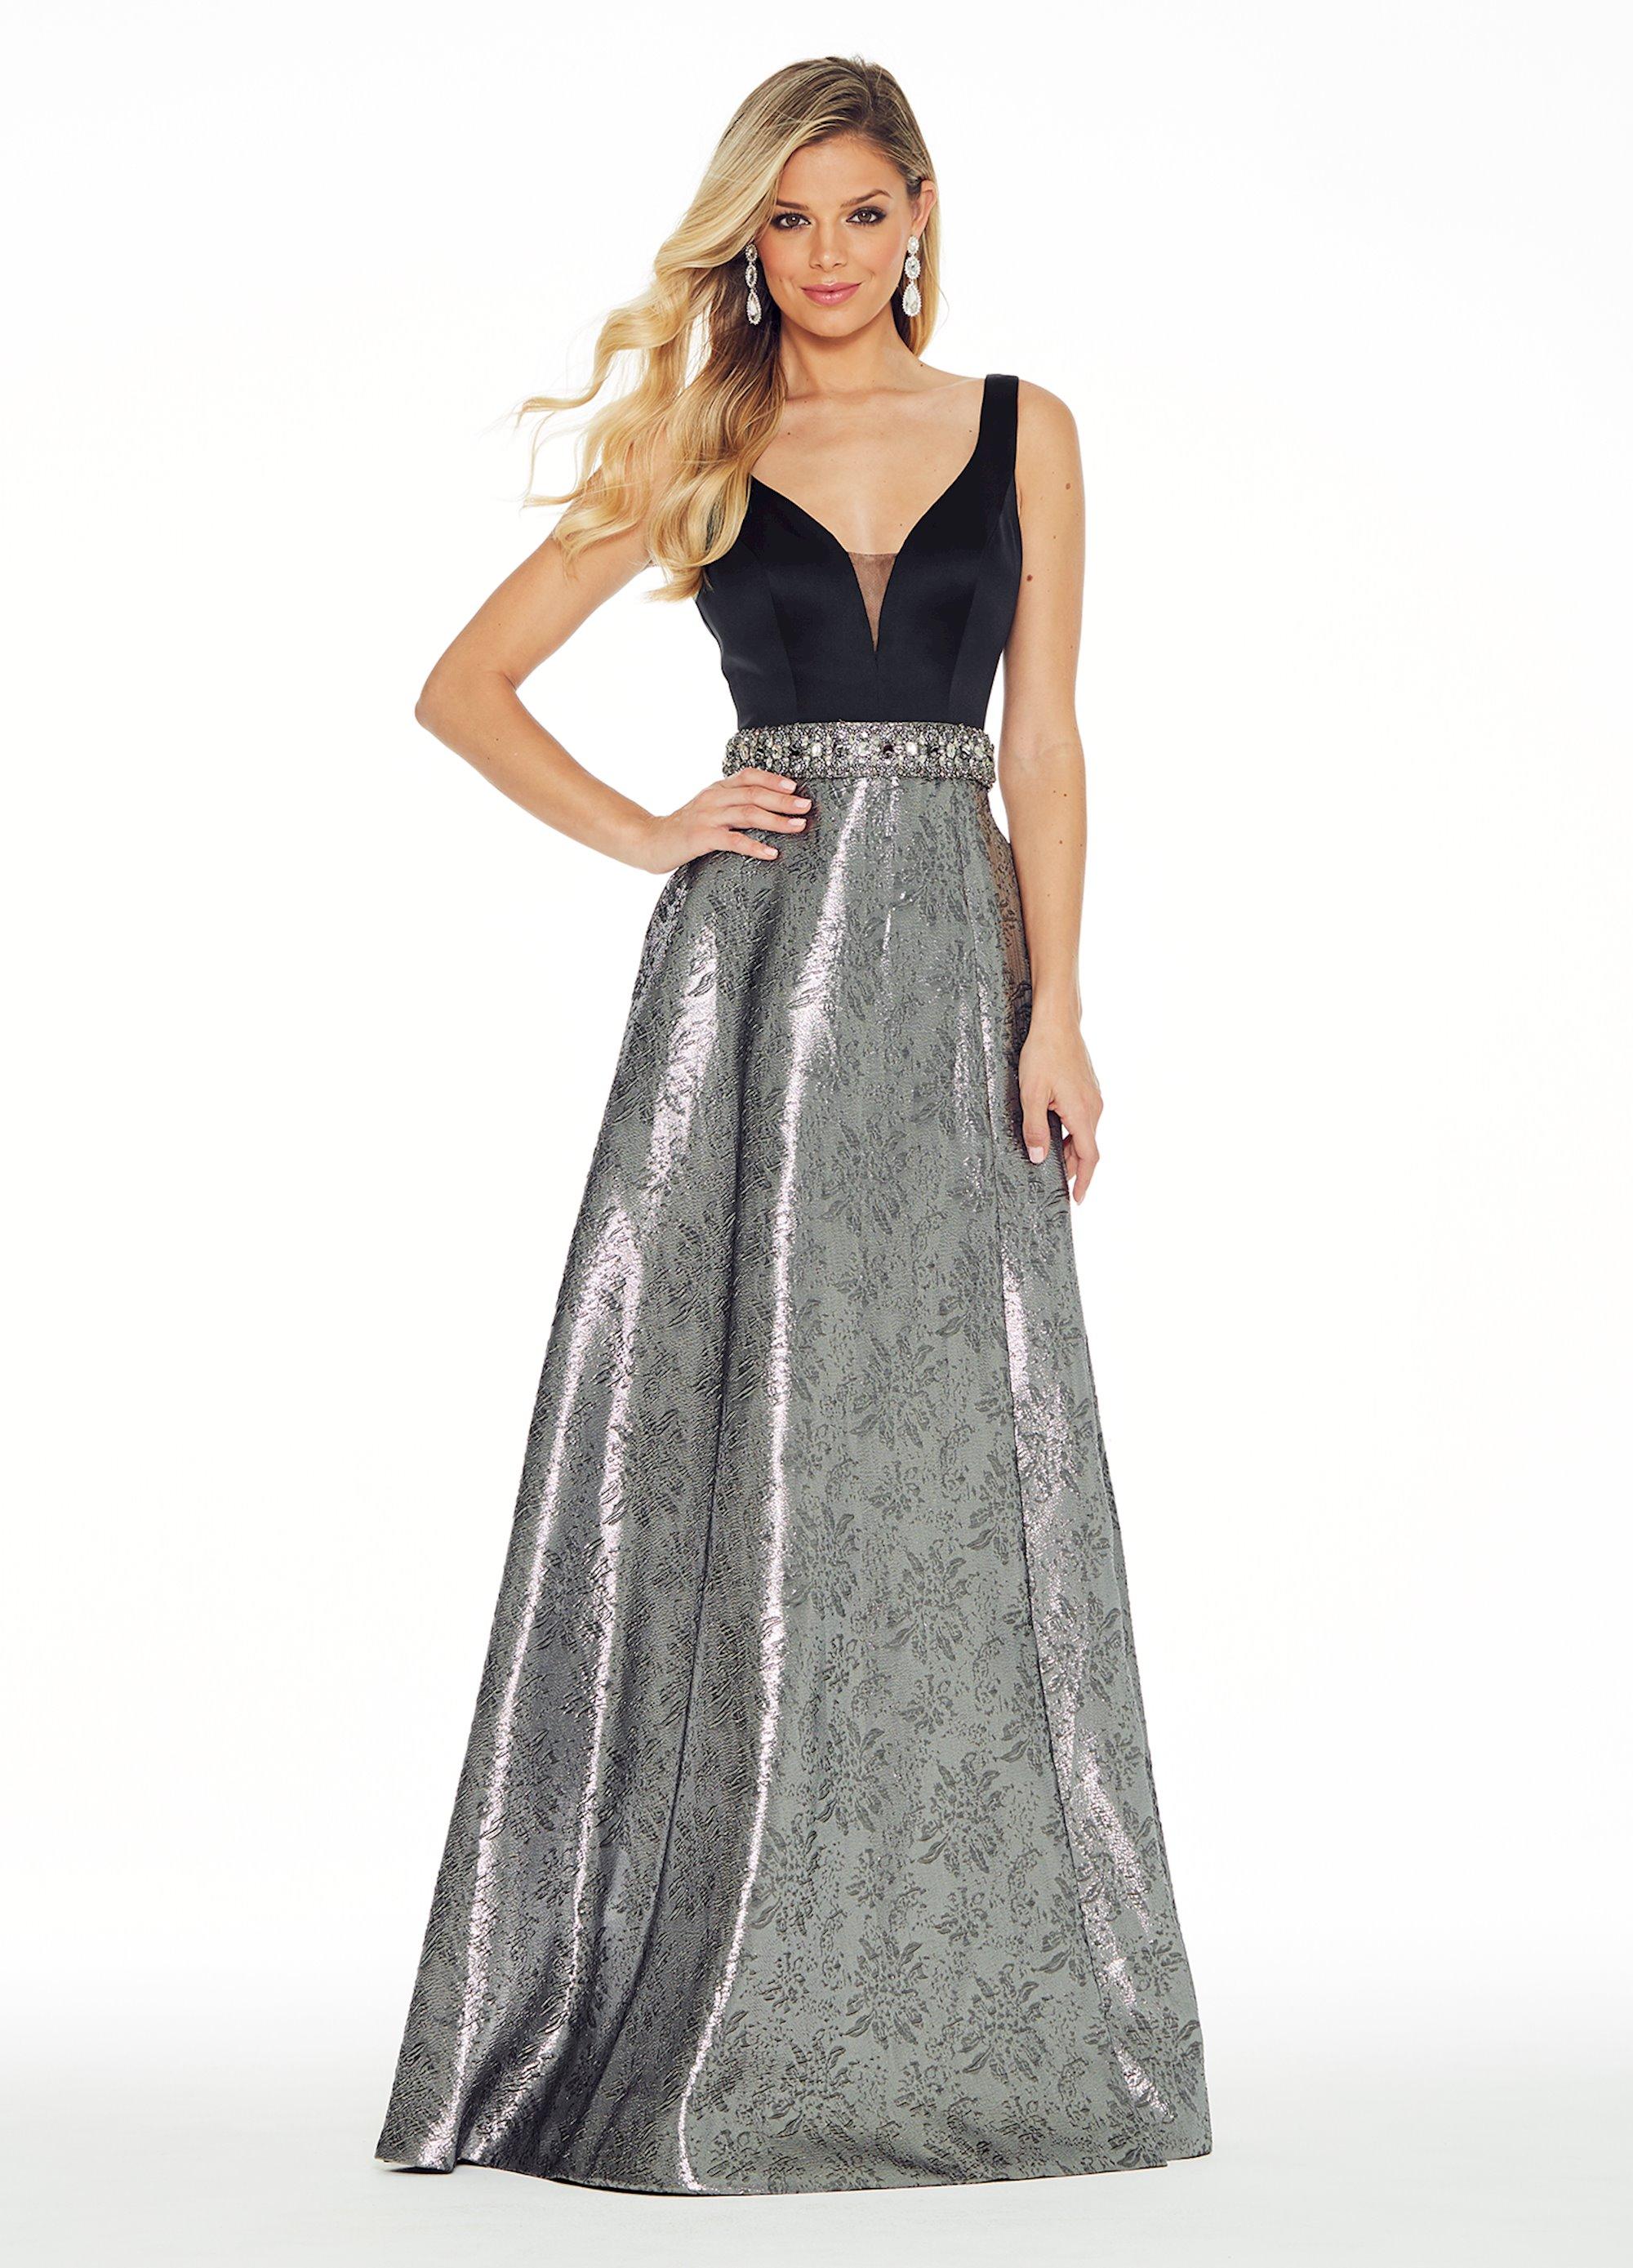 Pewter Evening Dresses